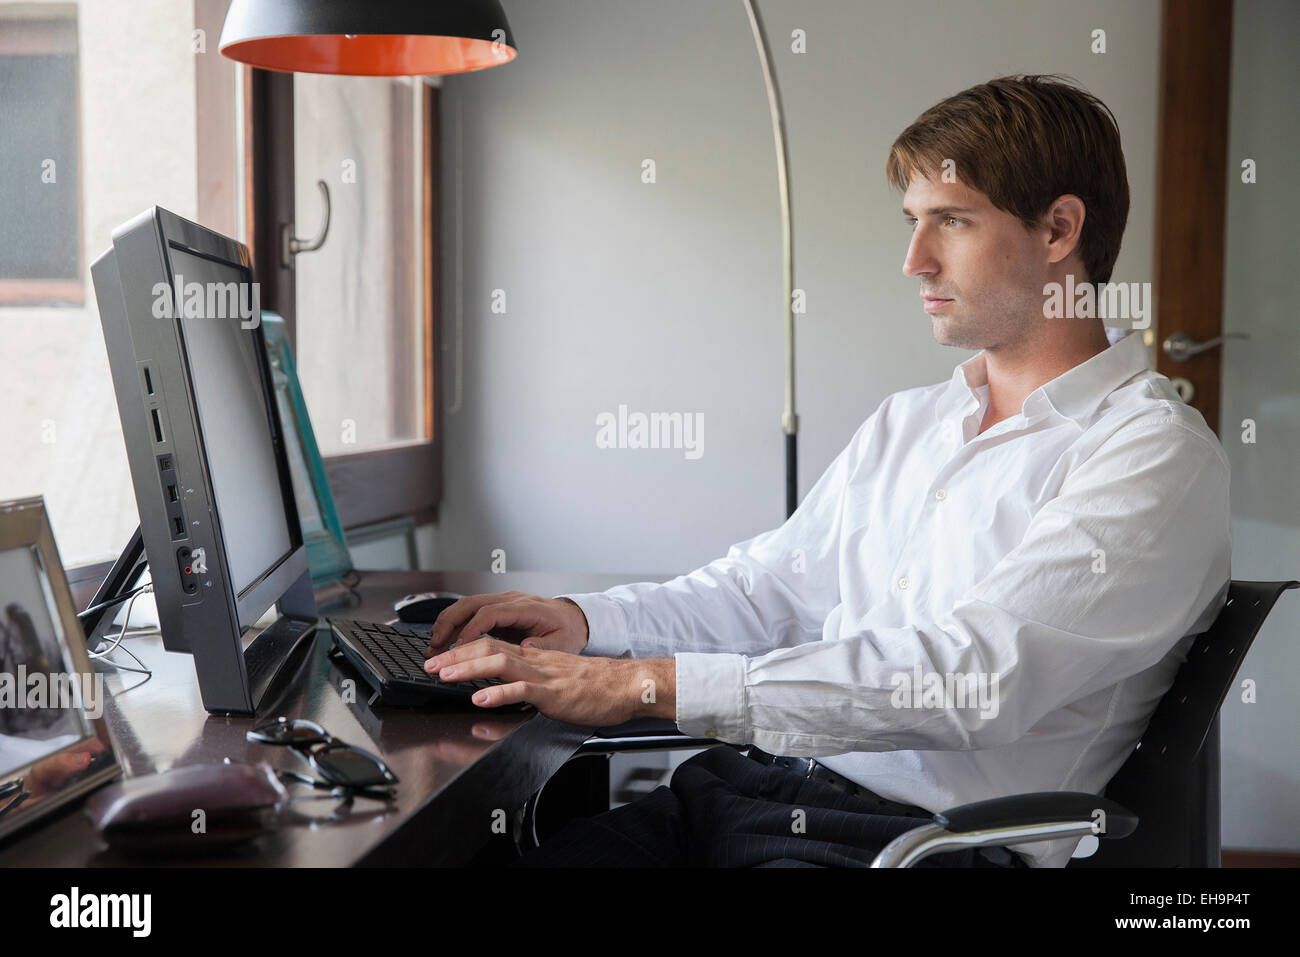 Man using desktop computer - Stock Image